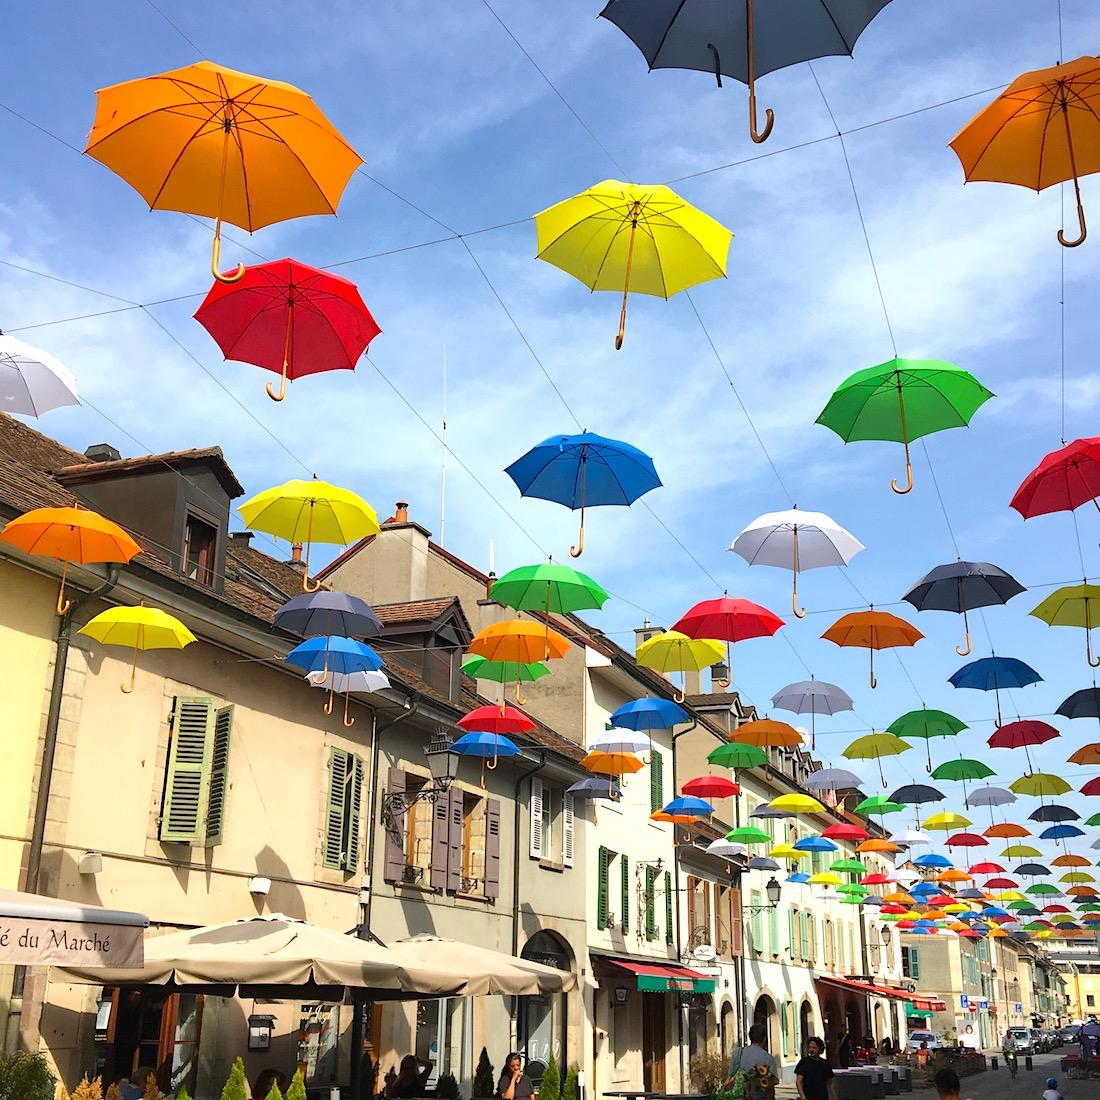 colorful umbrellas in sky.jpg